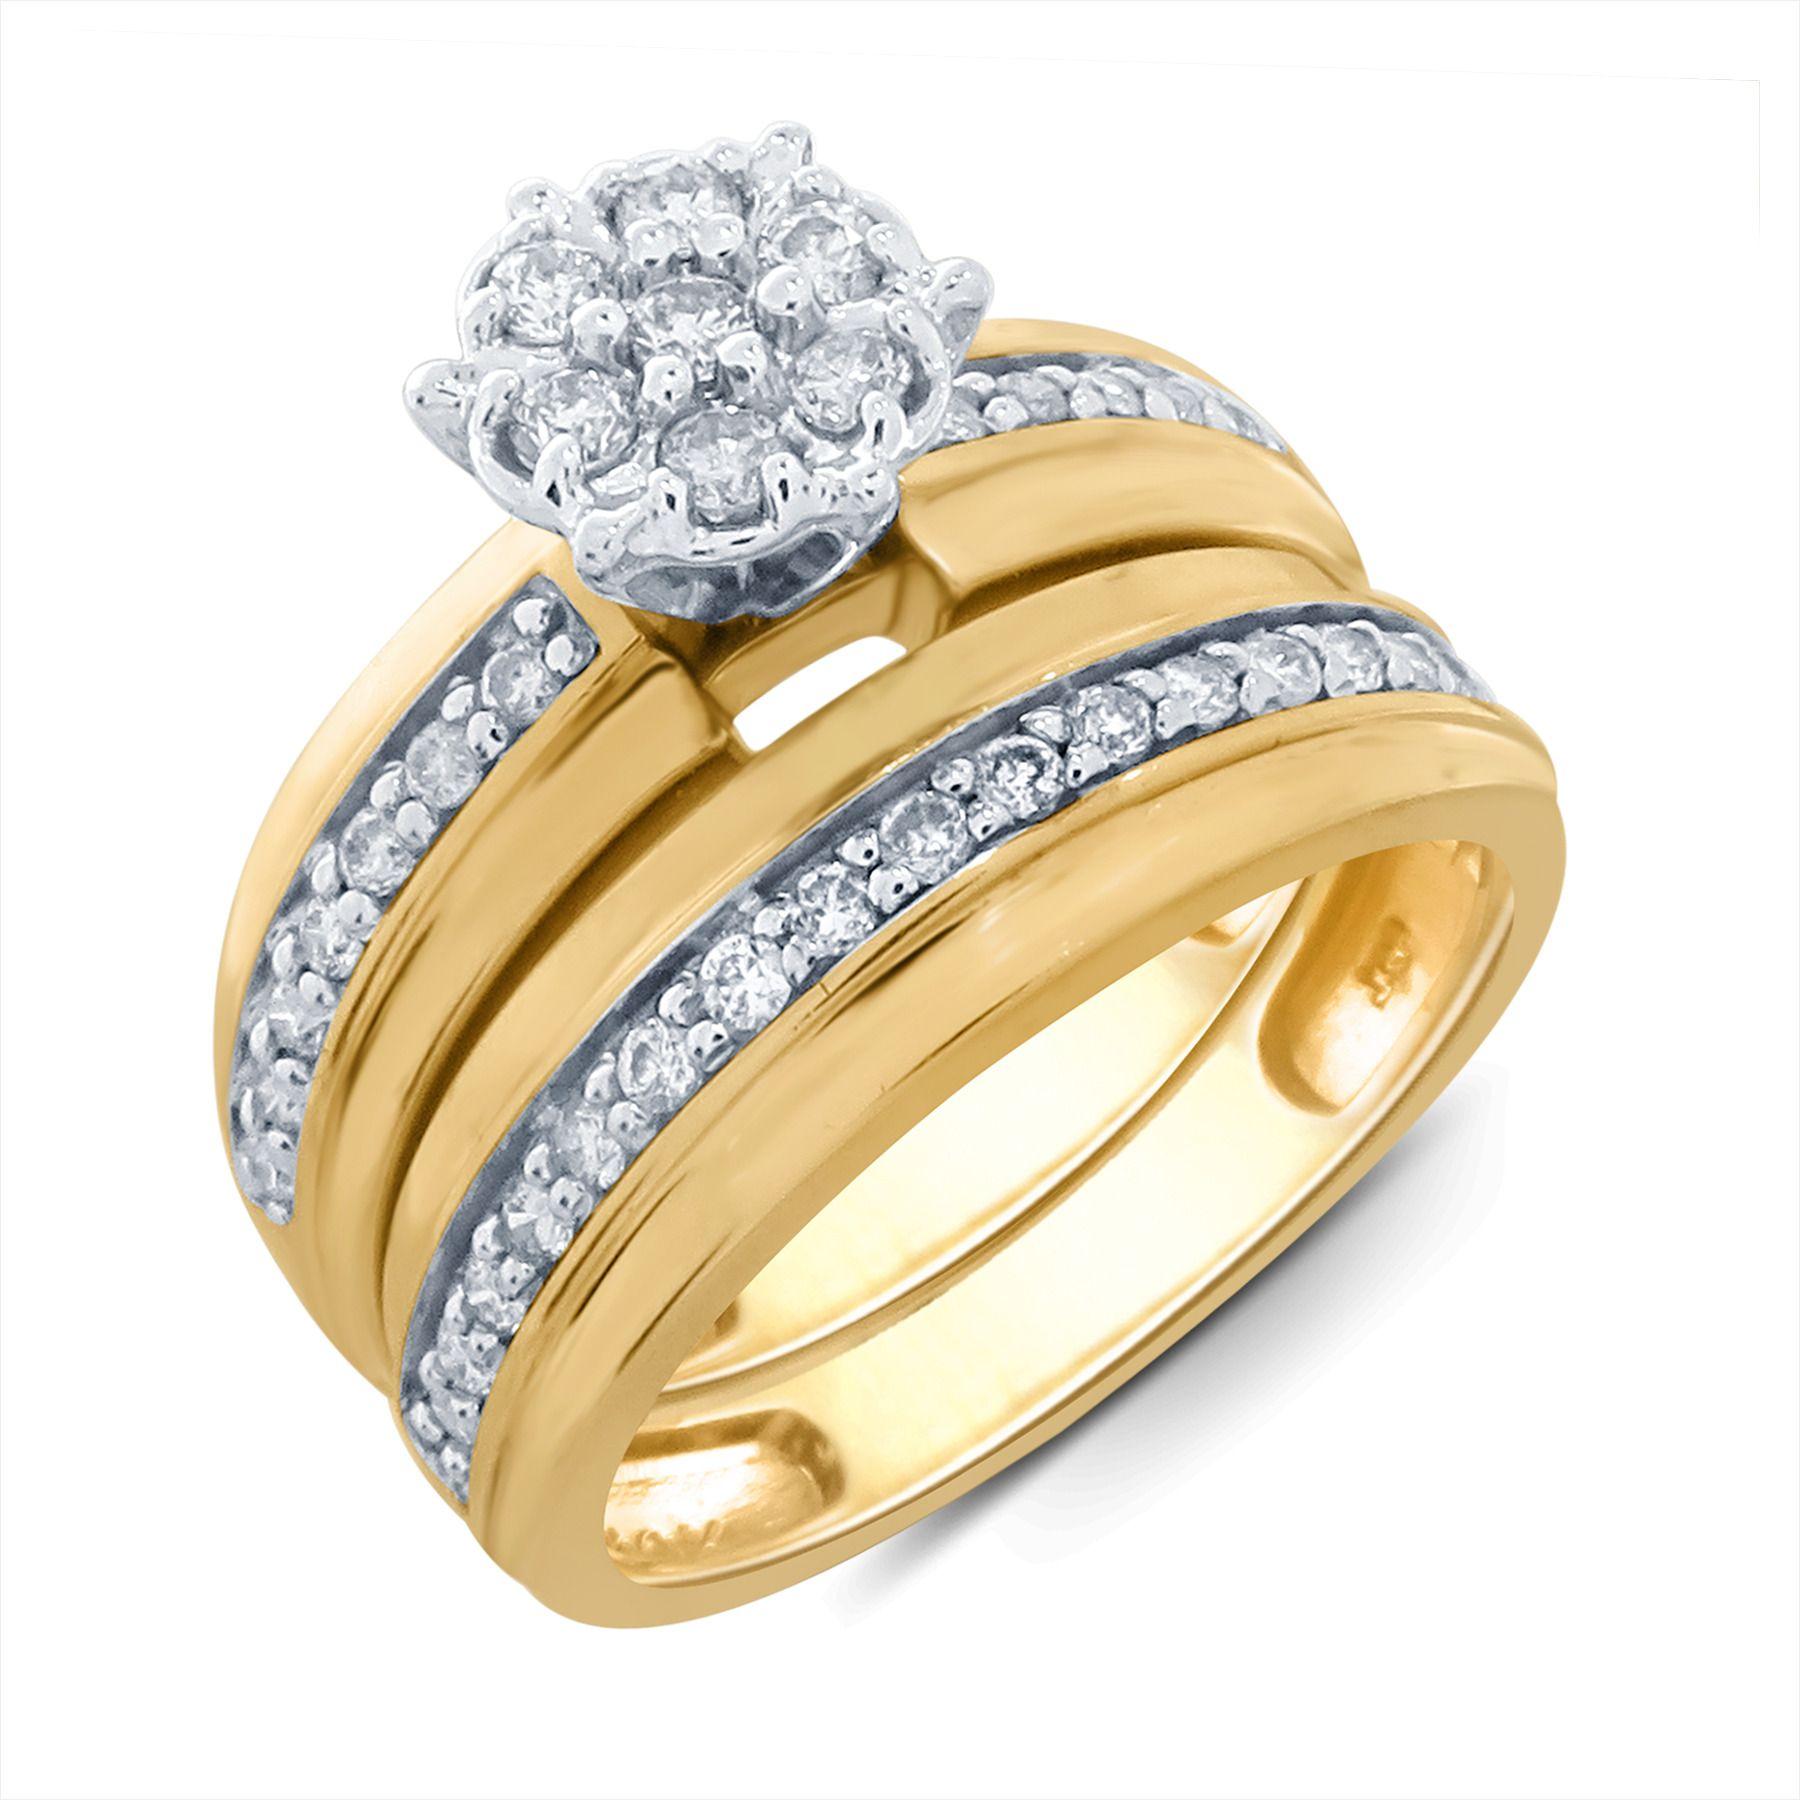 70 Classy Wedding Rings At Sears Ki55376 Ceramic Wedding Ring Classic Wedding Rings Wedding Ring Sets Unique